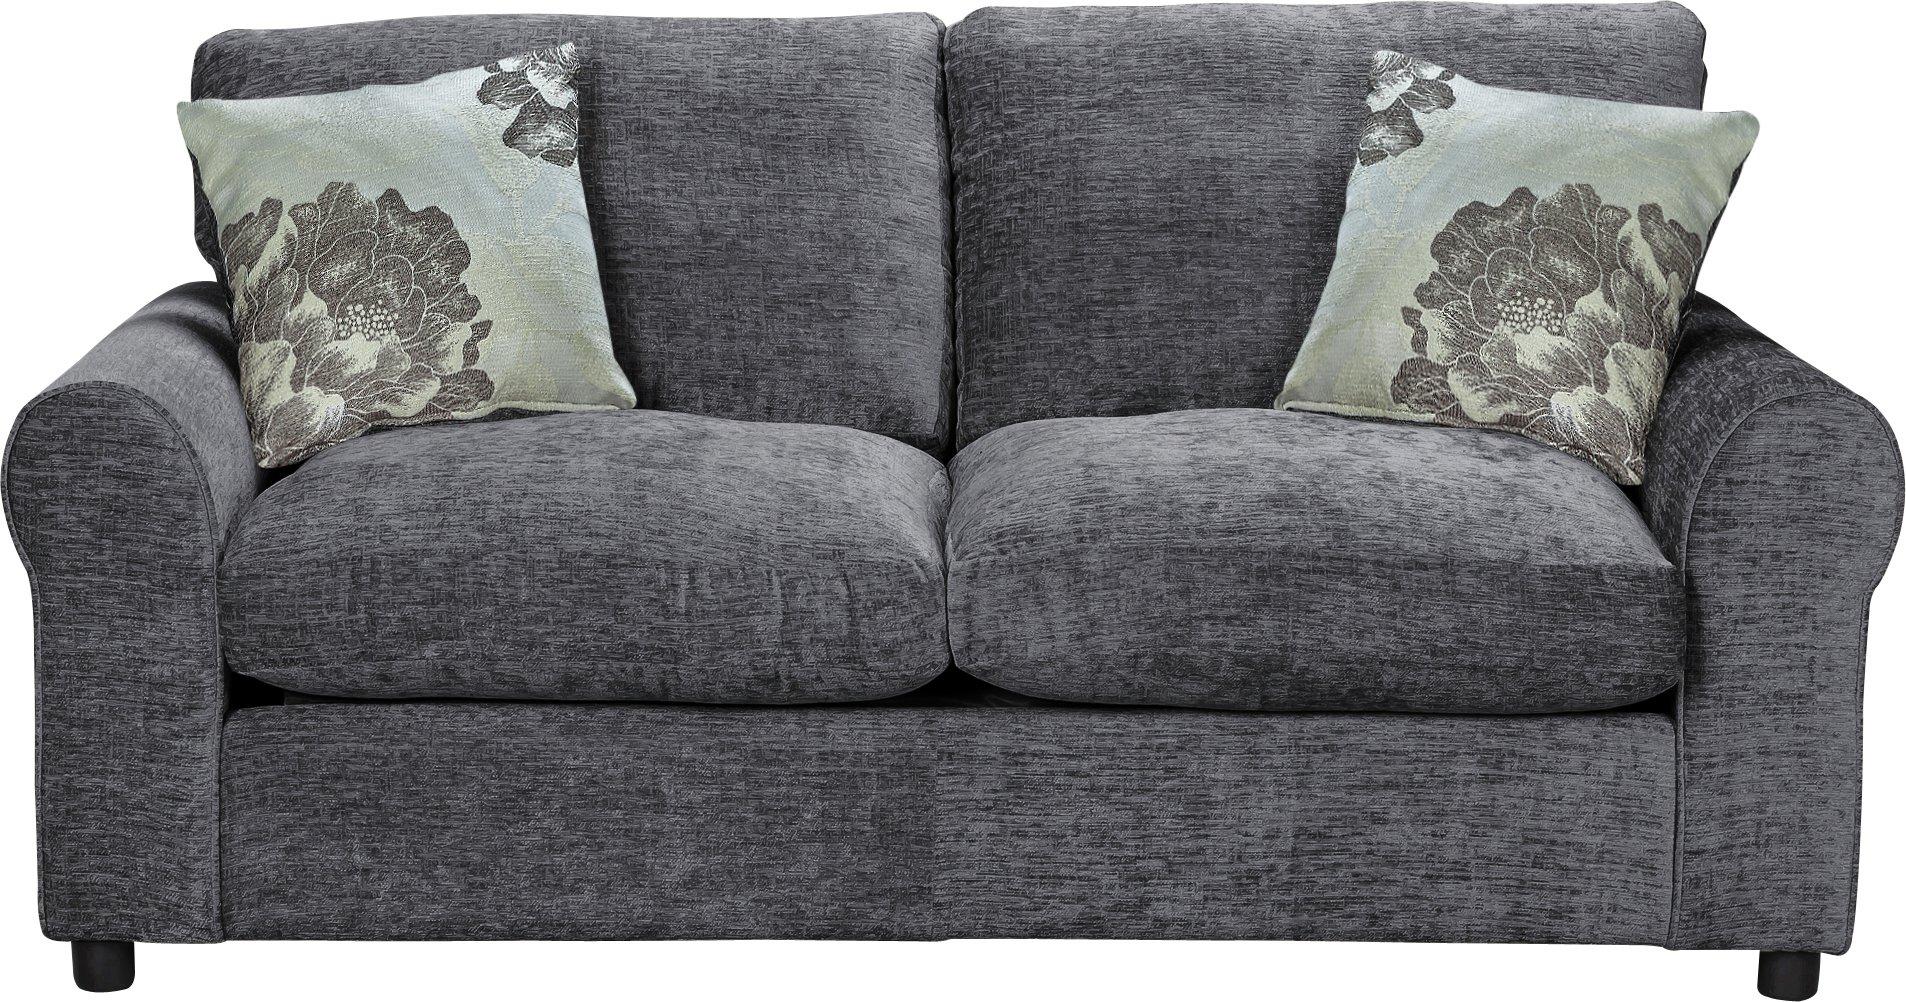 Argos 2 Bed Fabric Seater Home Tessa Sofa Charcoal n0wyOPmN8v